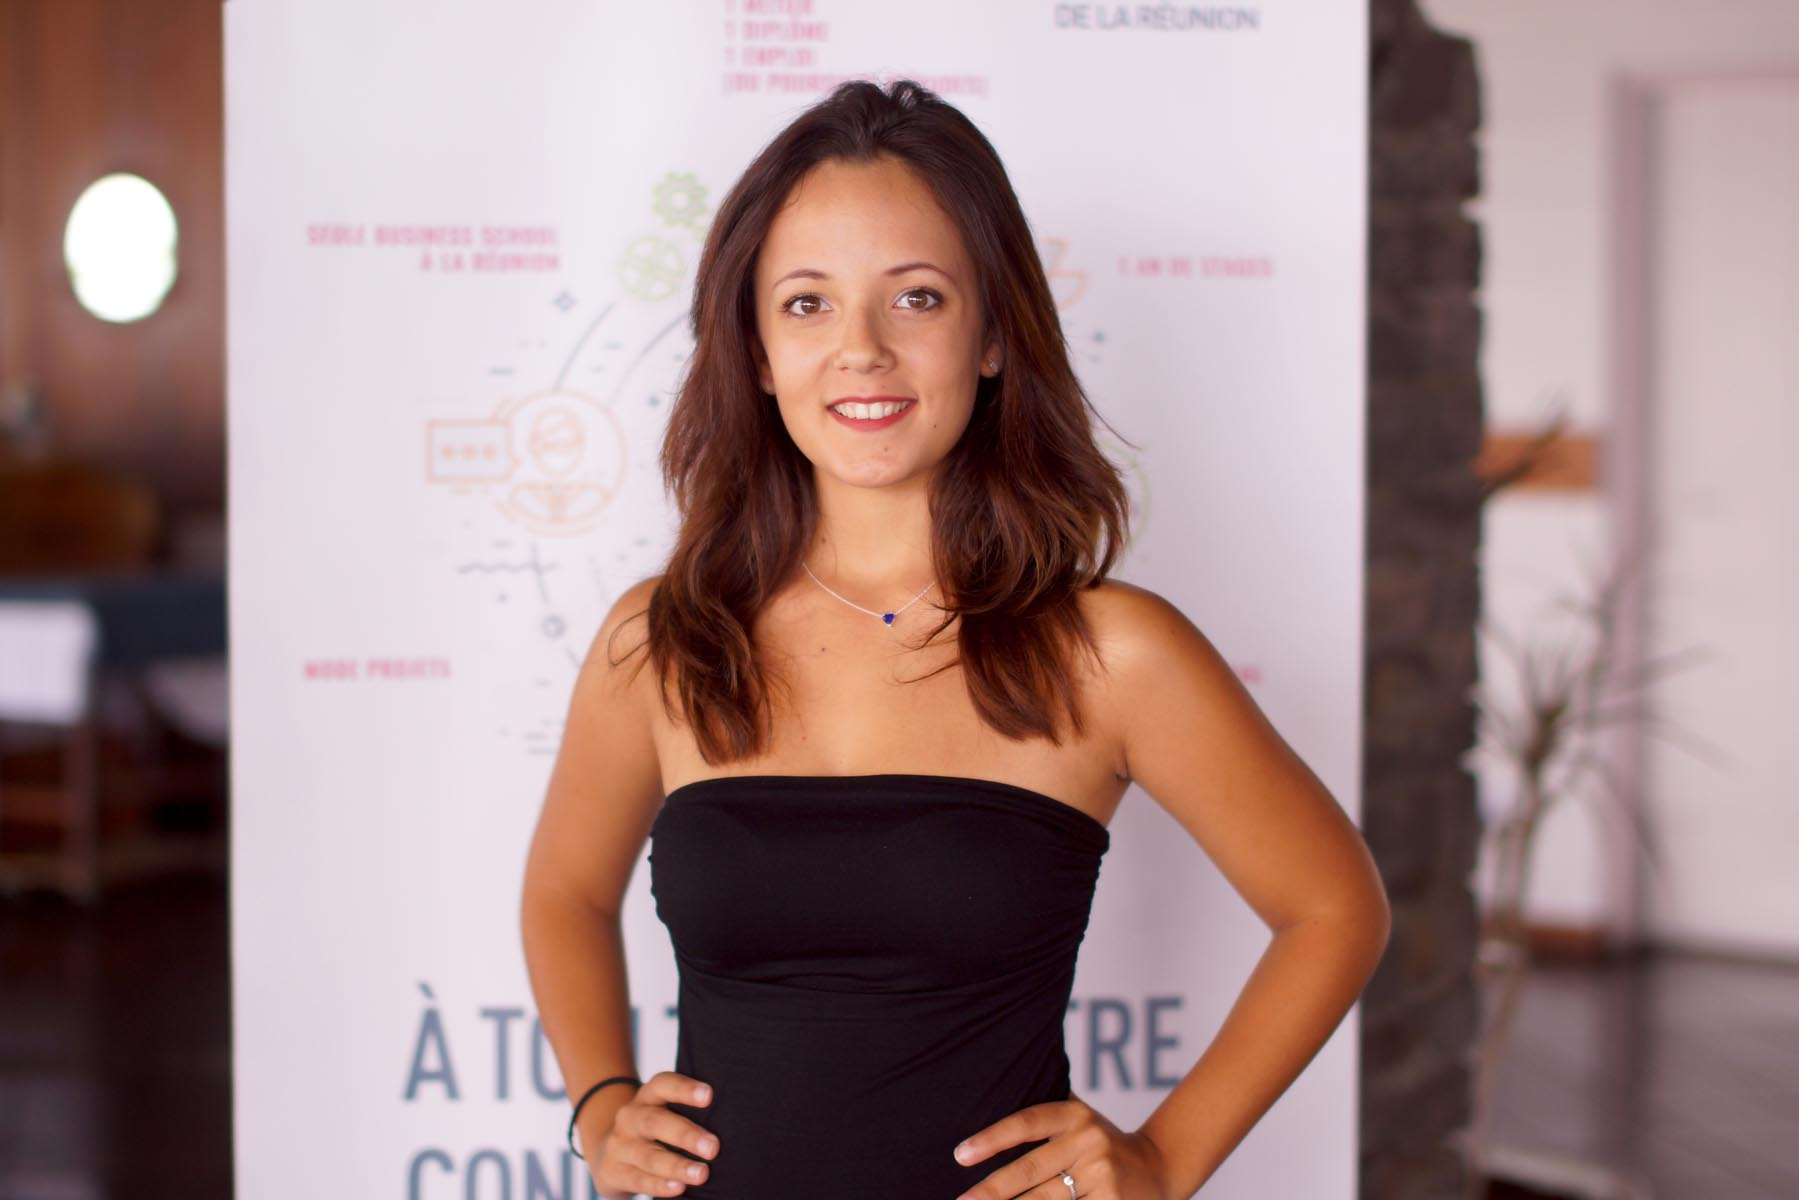 N°1 : Emma Lossy, 19 ans,  Licence Administration Economique et Sociale